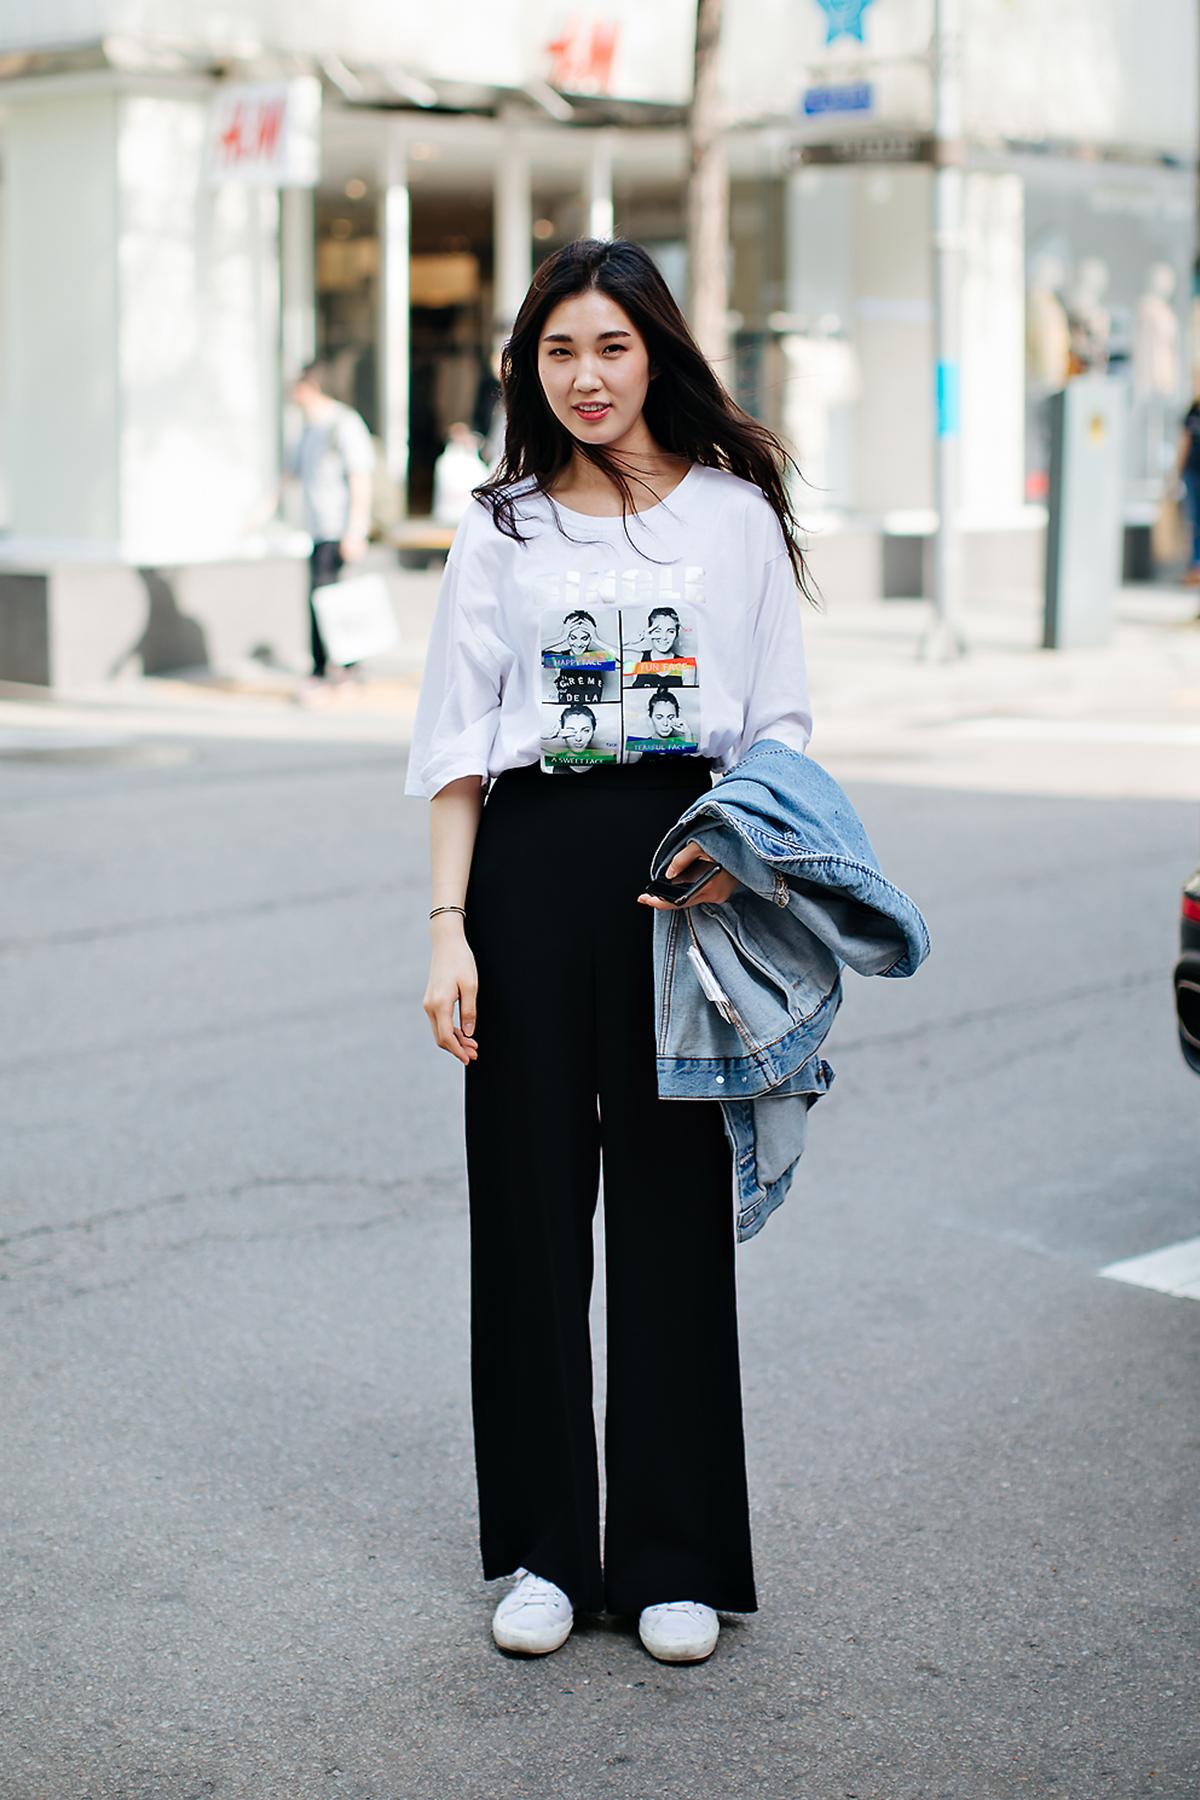 Han Songa, Street style women spring 2018 in seoul